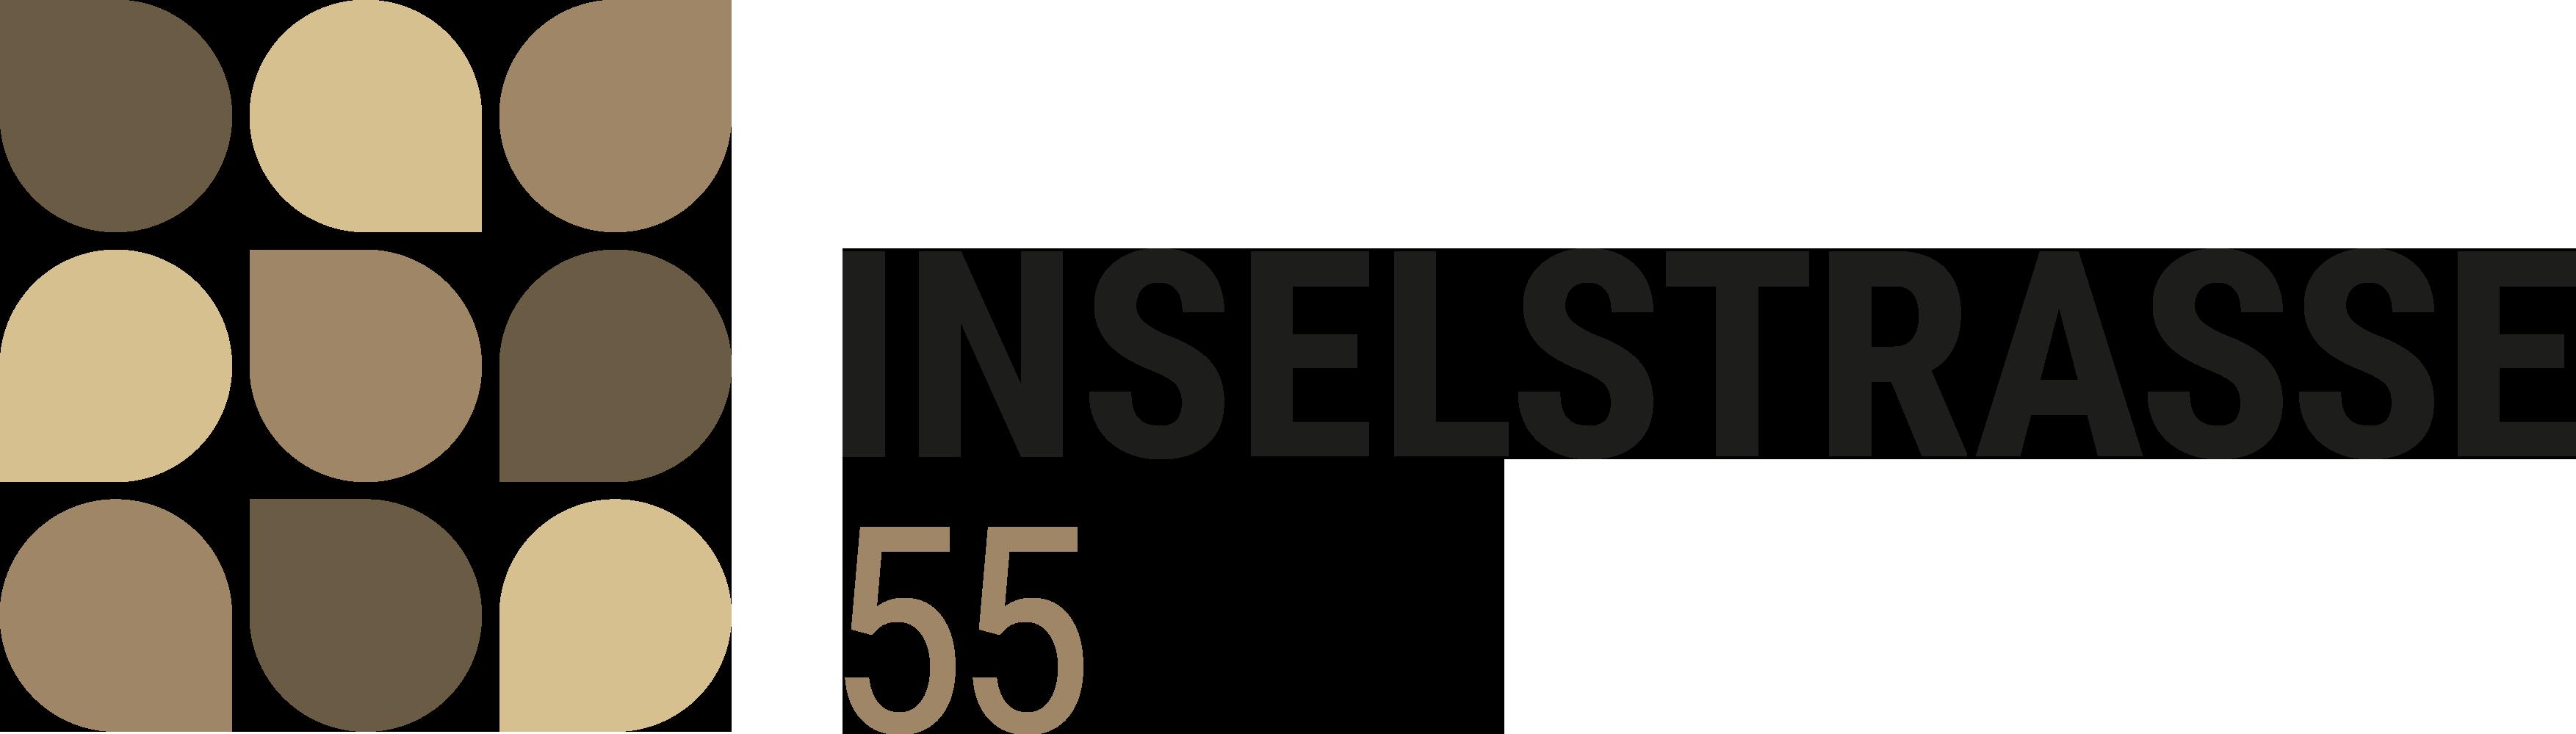 PKSBB Inselstrasse 55, Basel